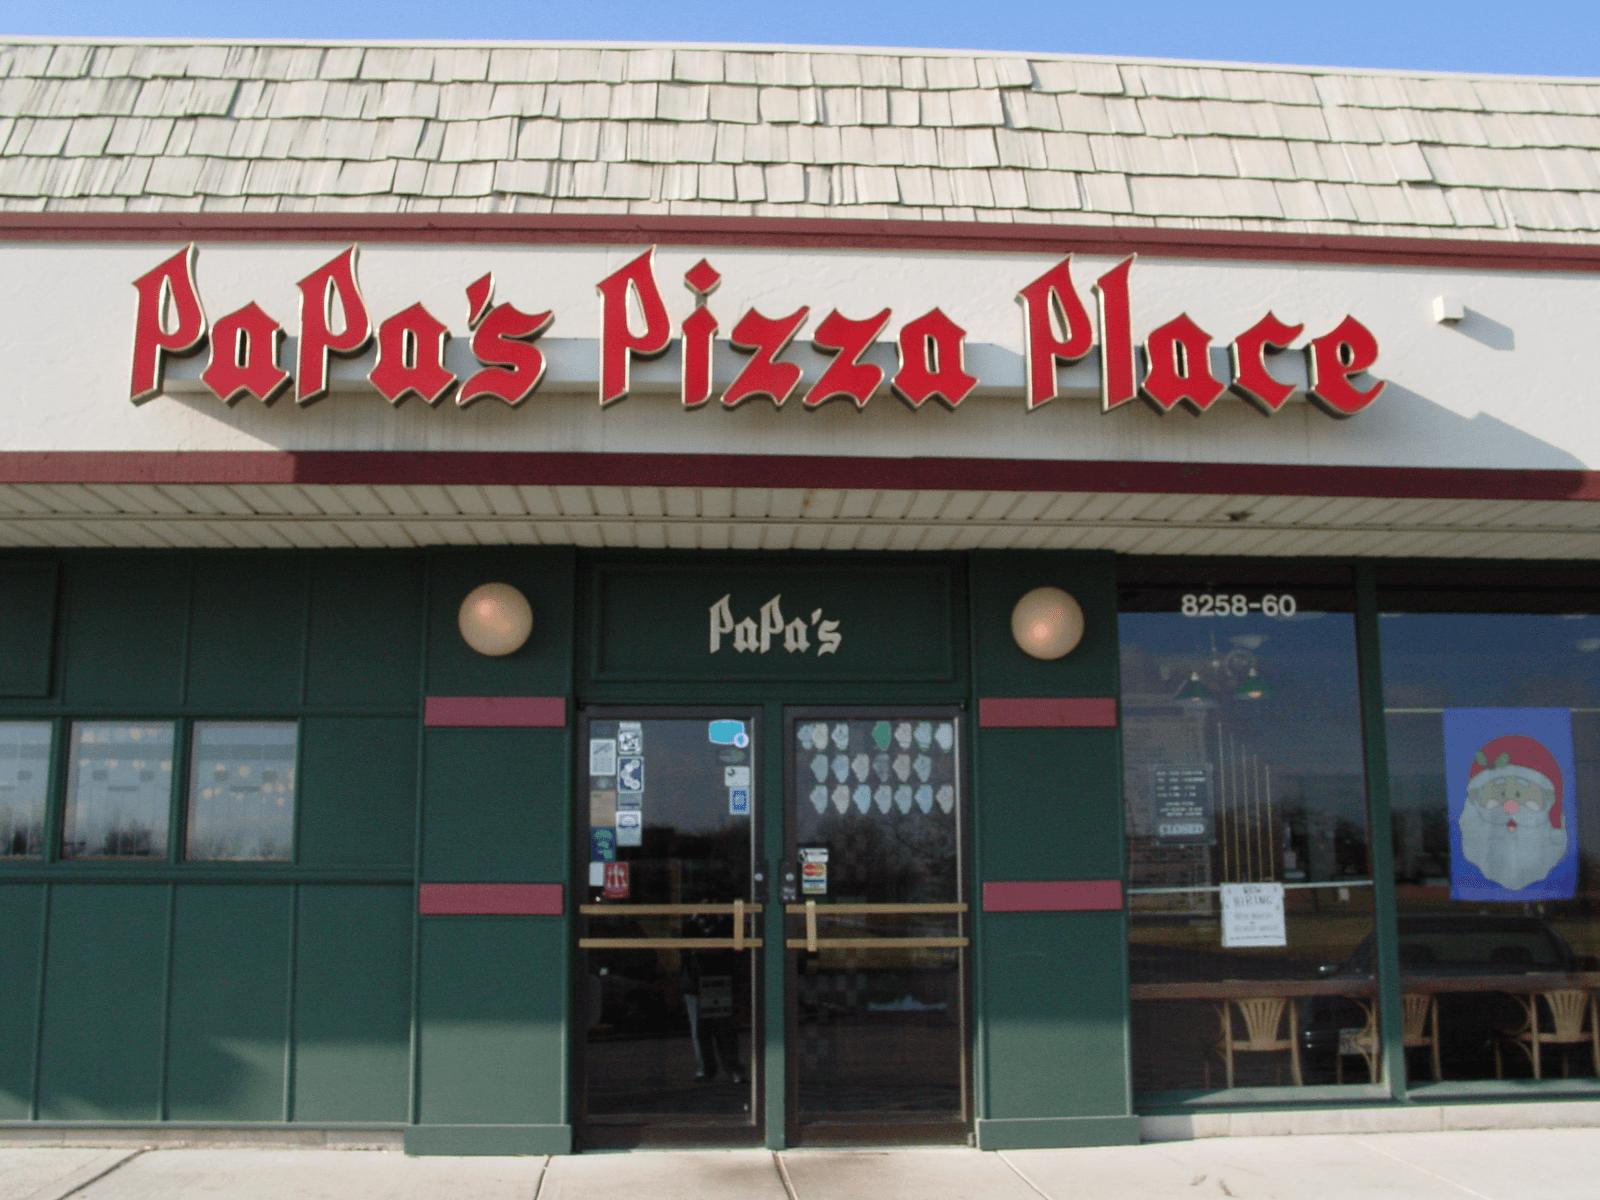 Papa's Pizza Place - Woodridge, IL